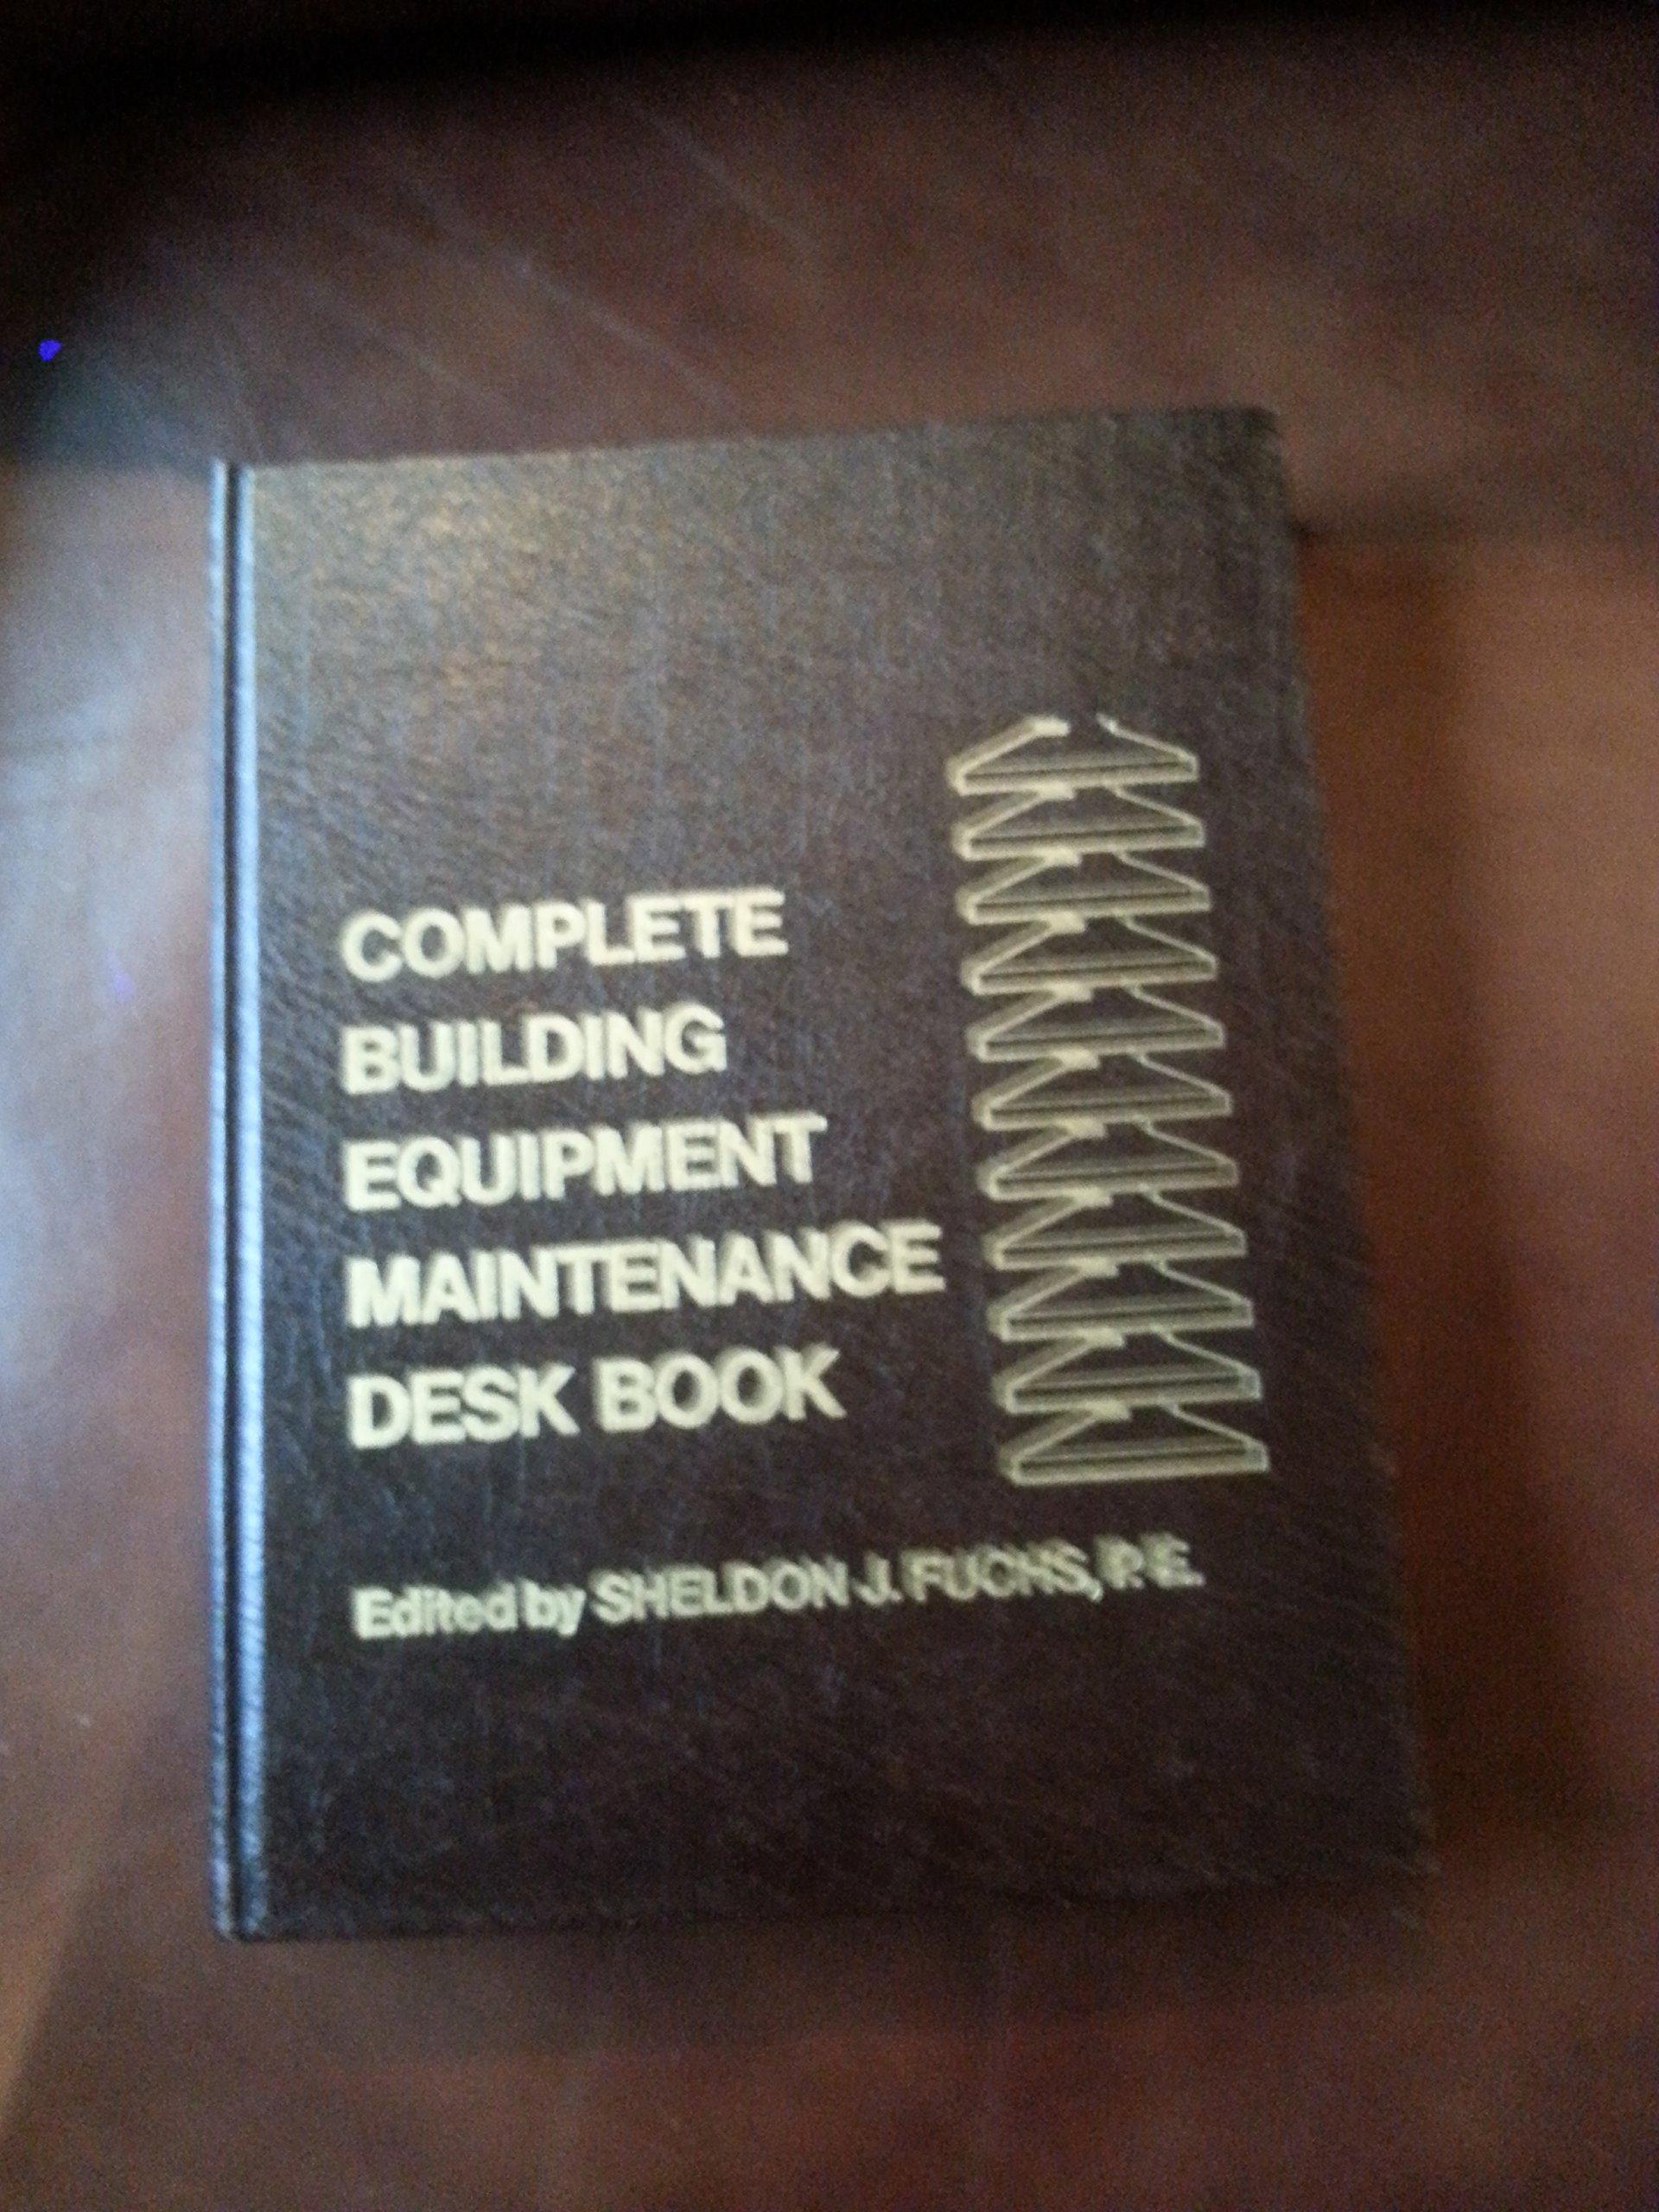 Complete building equipment maintenance desk book